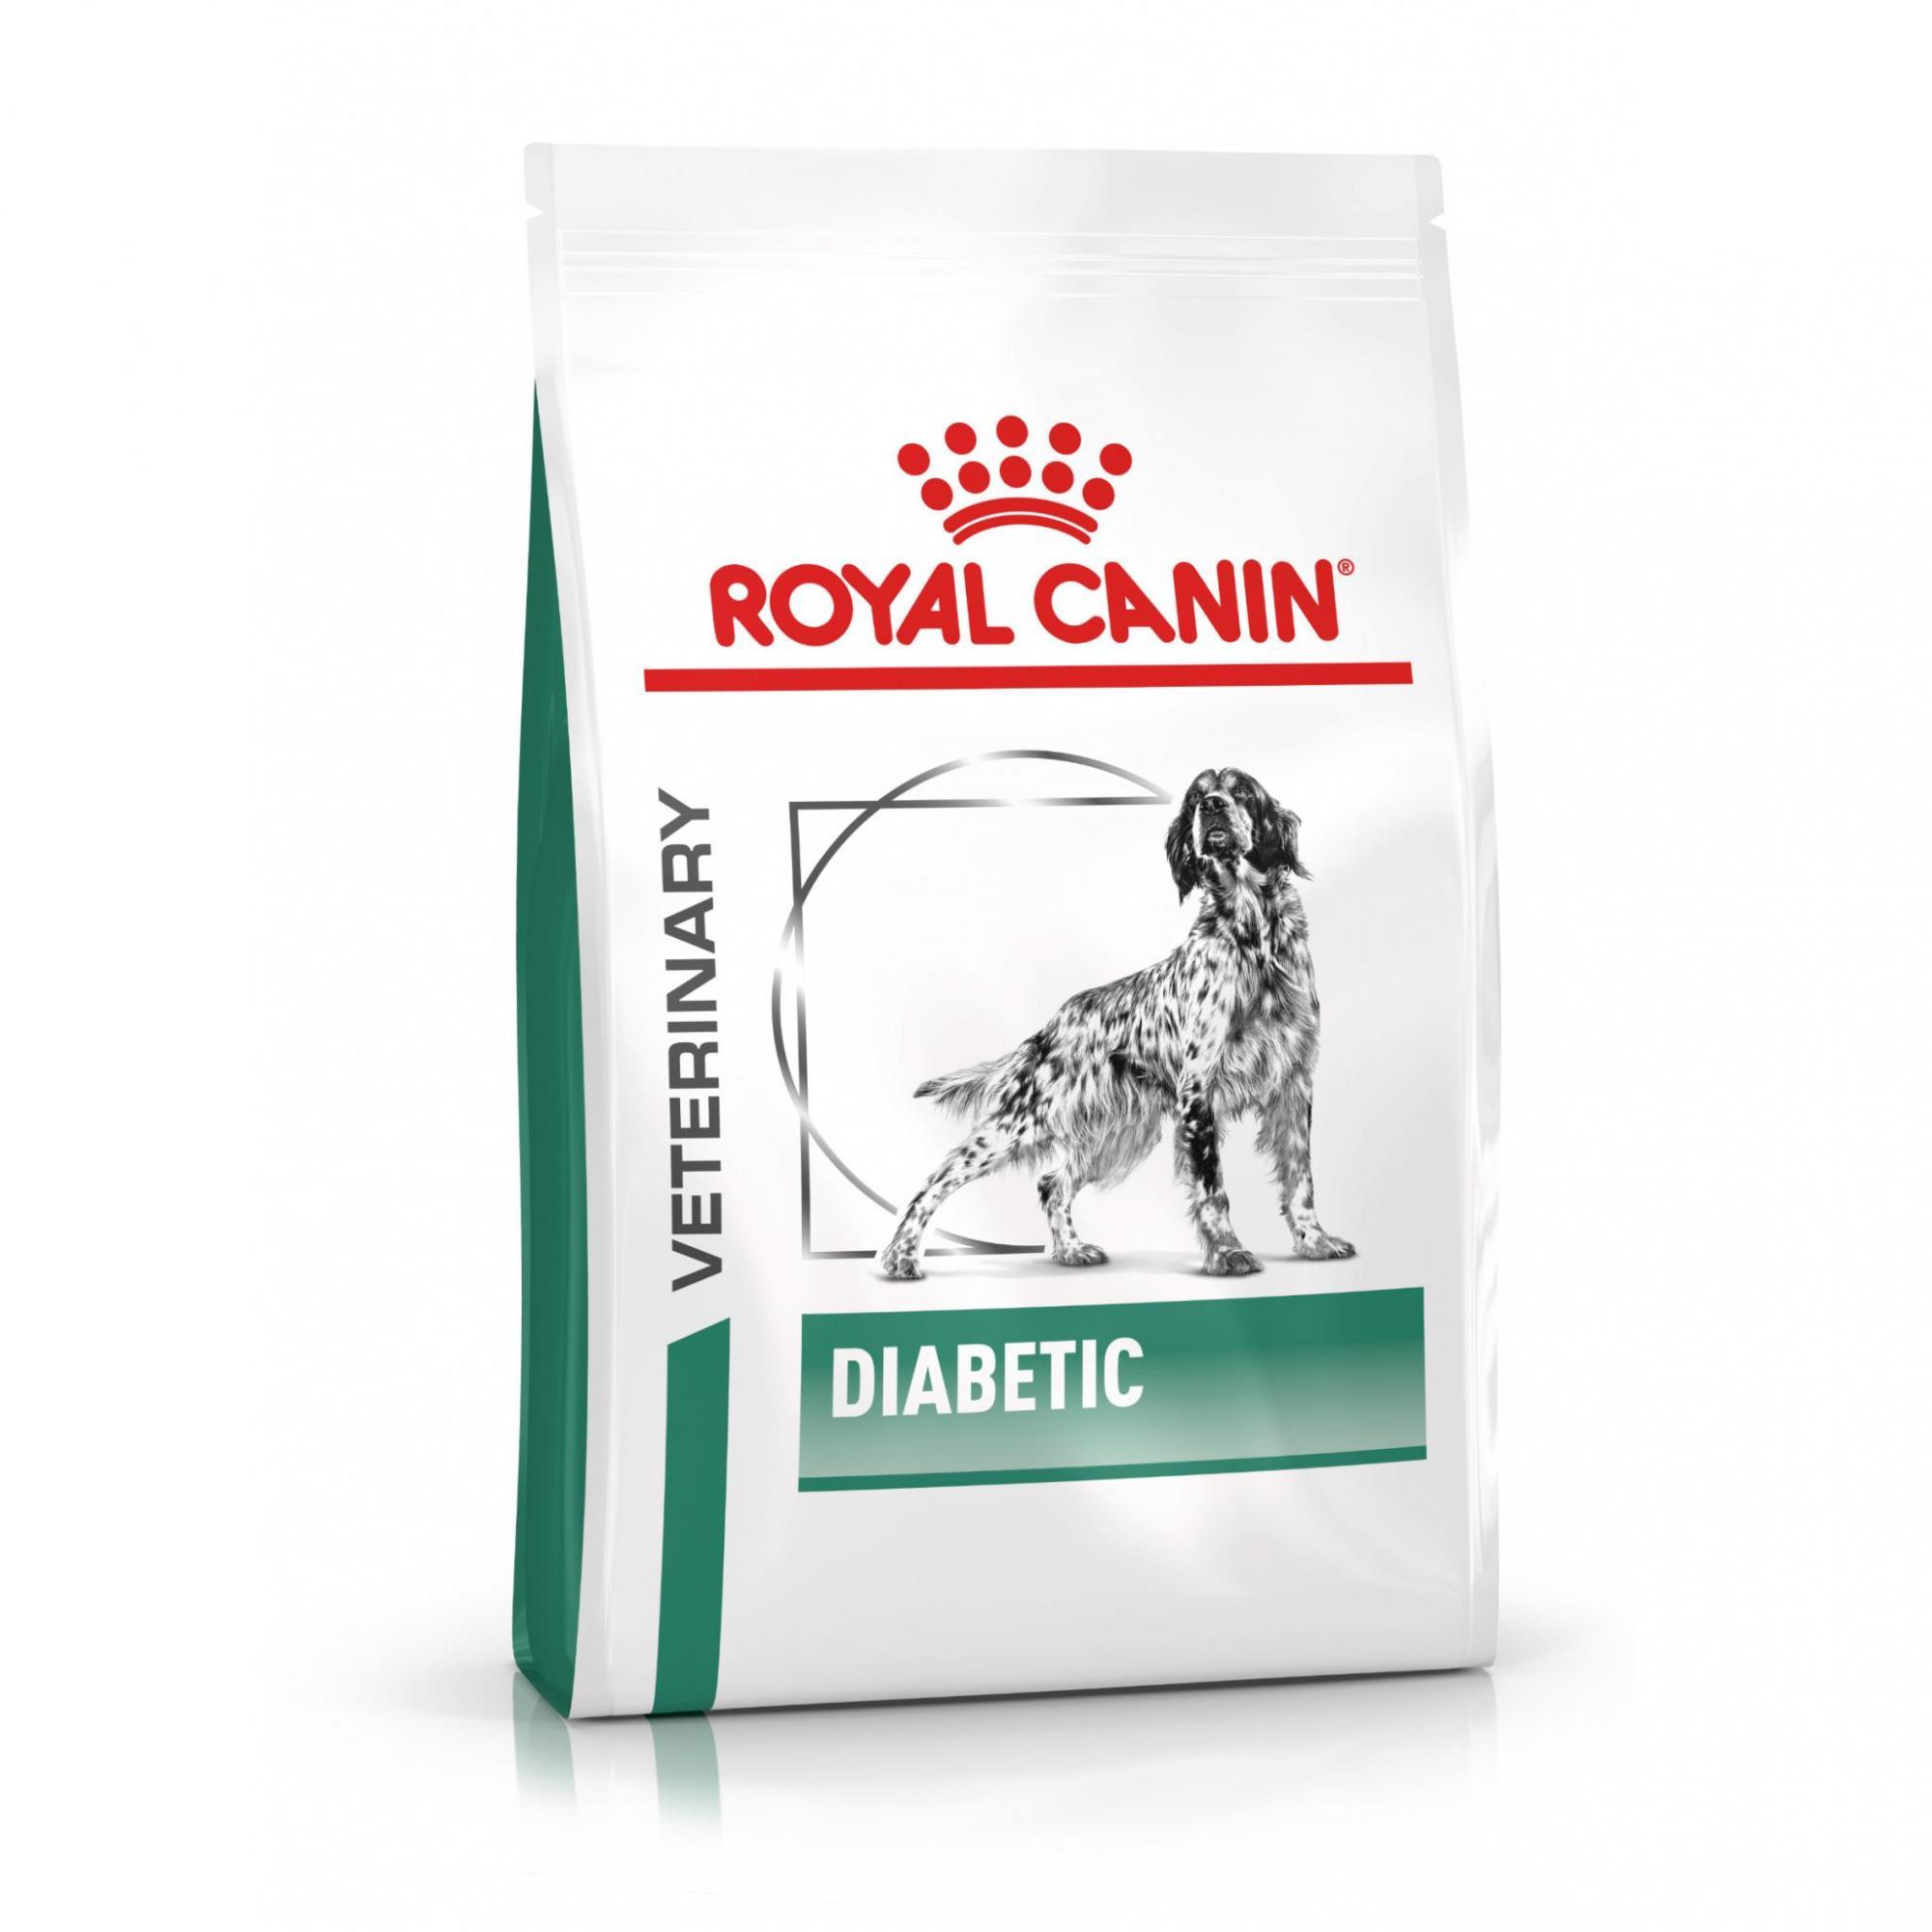 Royal Canin Veterinary Health Nutrition Dog DIABETIC - 1,5kg